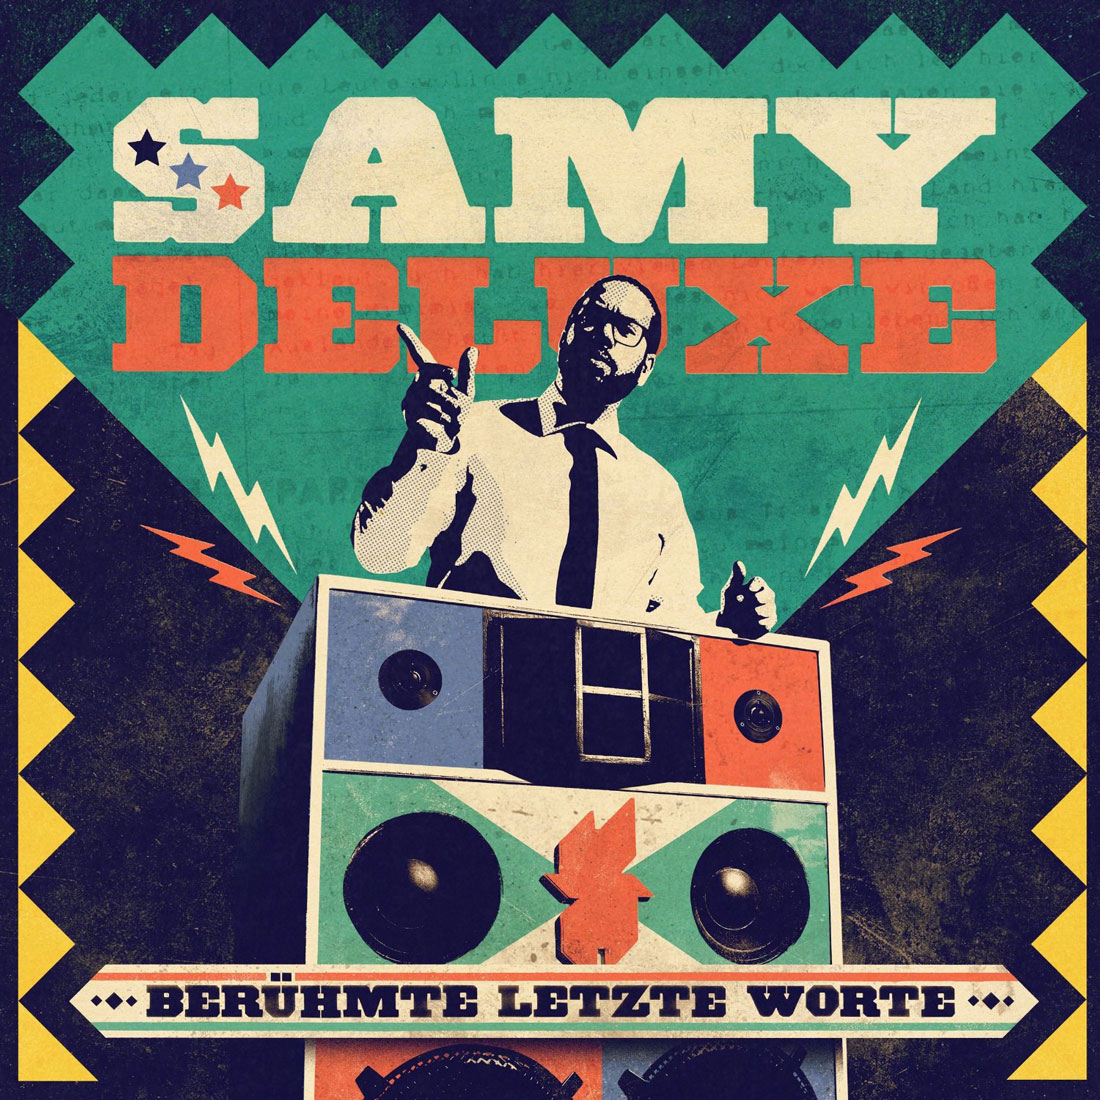 Samy Deluxe Berühmte letzte Worte Album